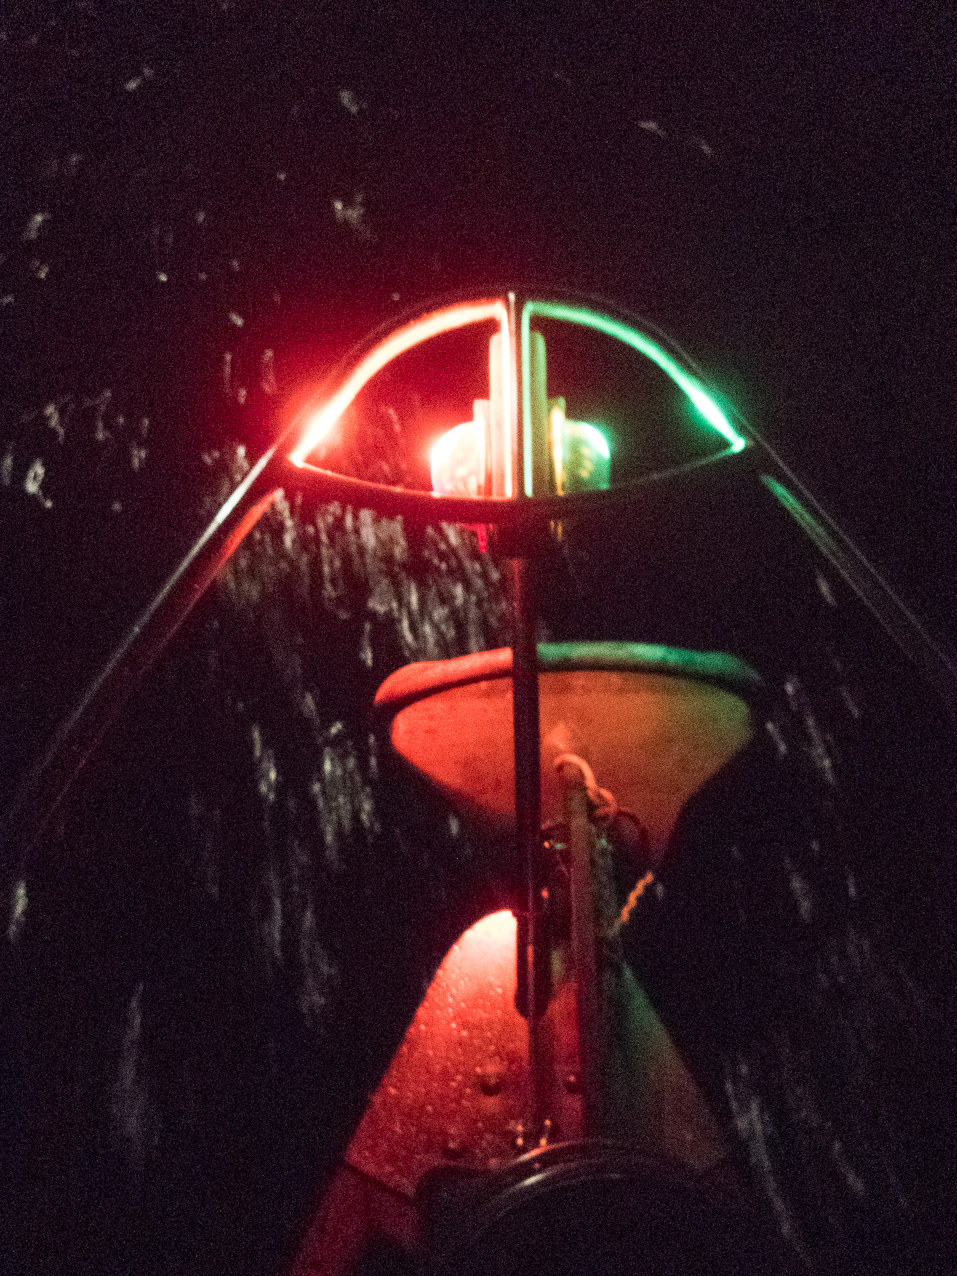 duncan-mckenzie-night-sailing-navigation-lights.jpg